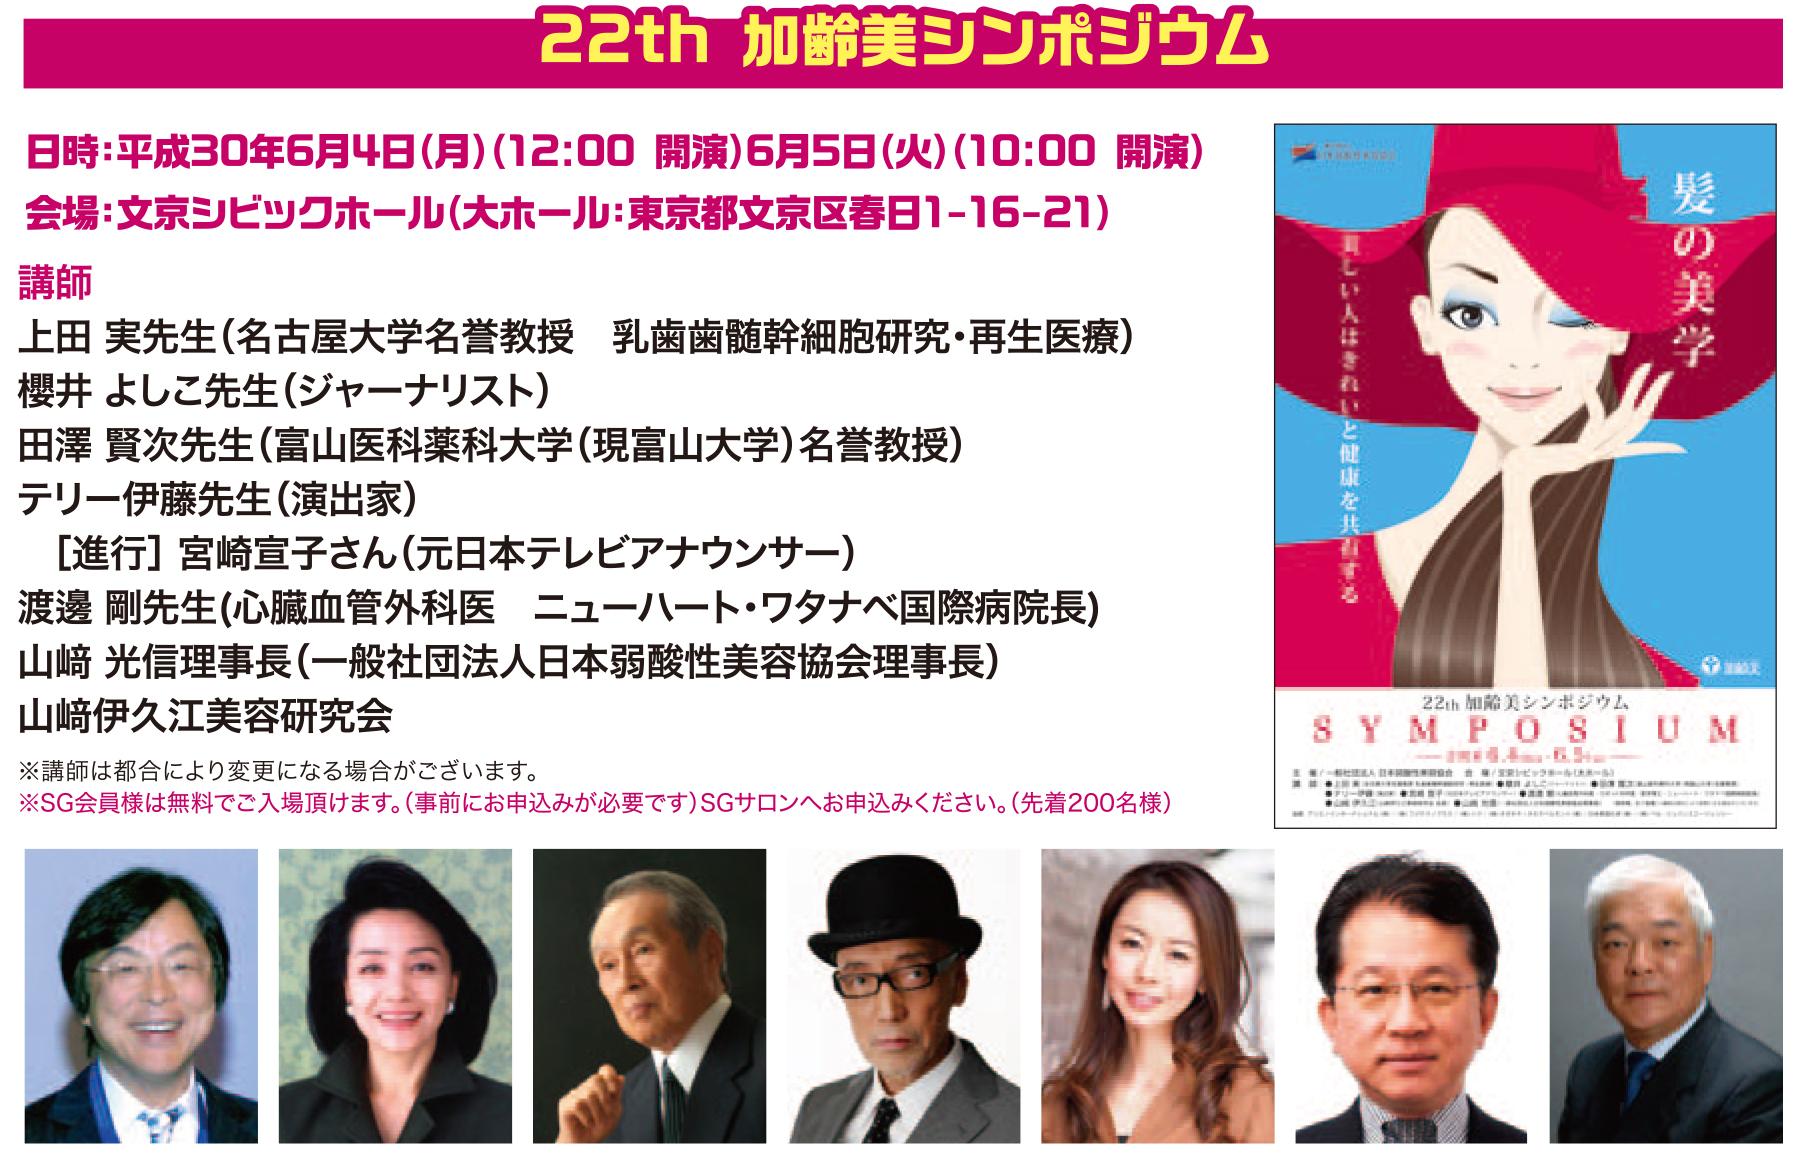 http://jakusan.net/community/images/phi_159_final-8.jpg